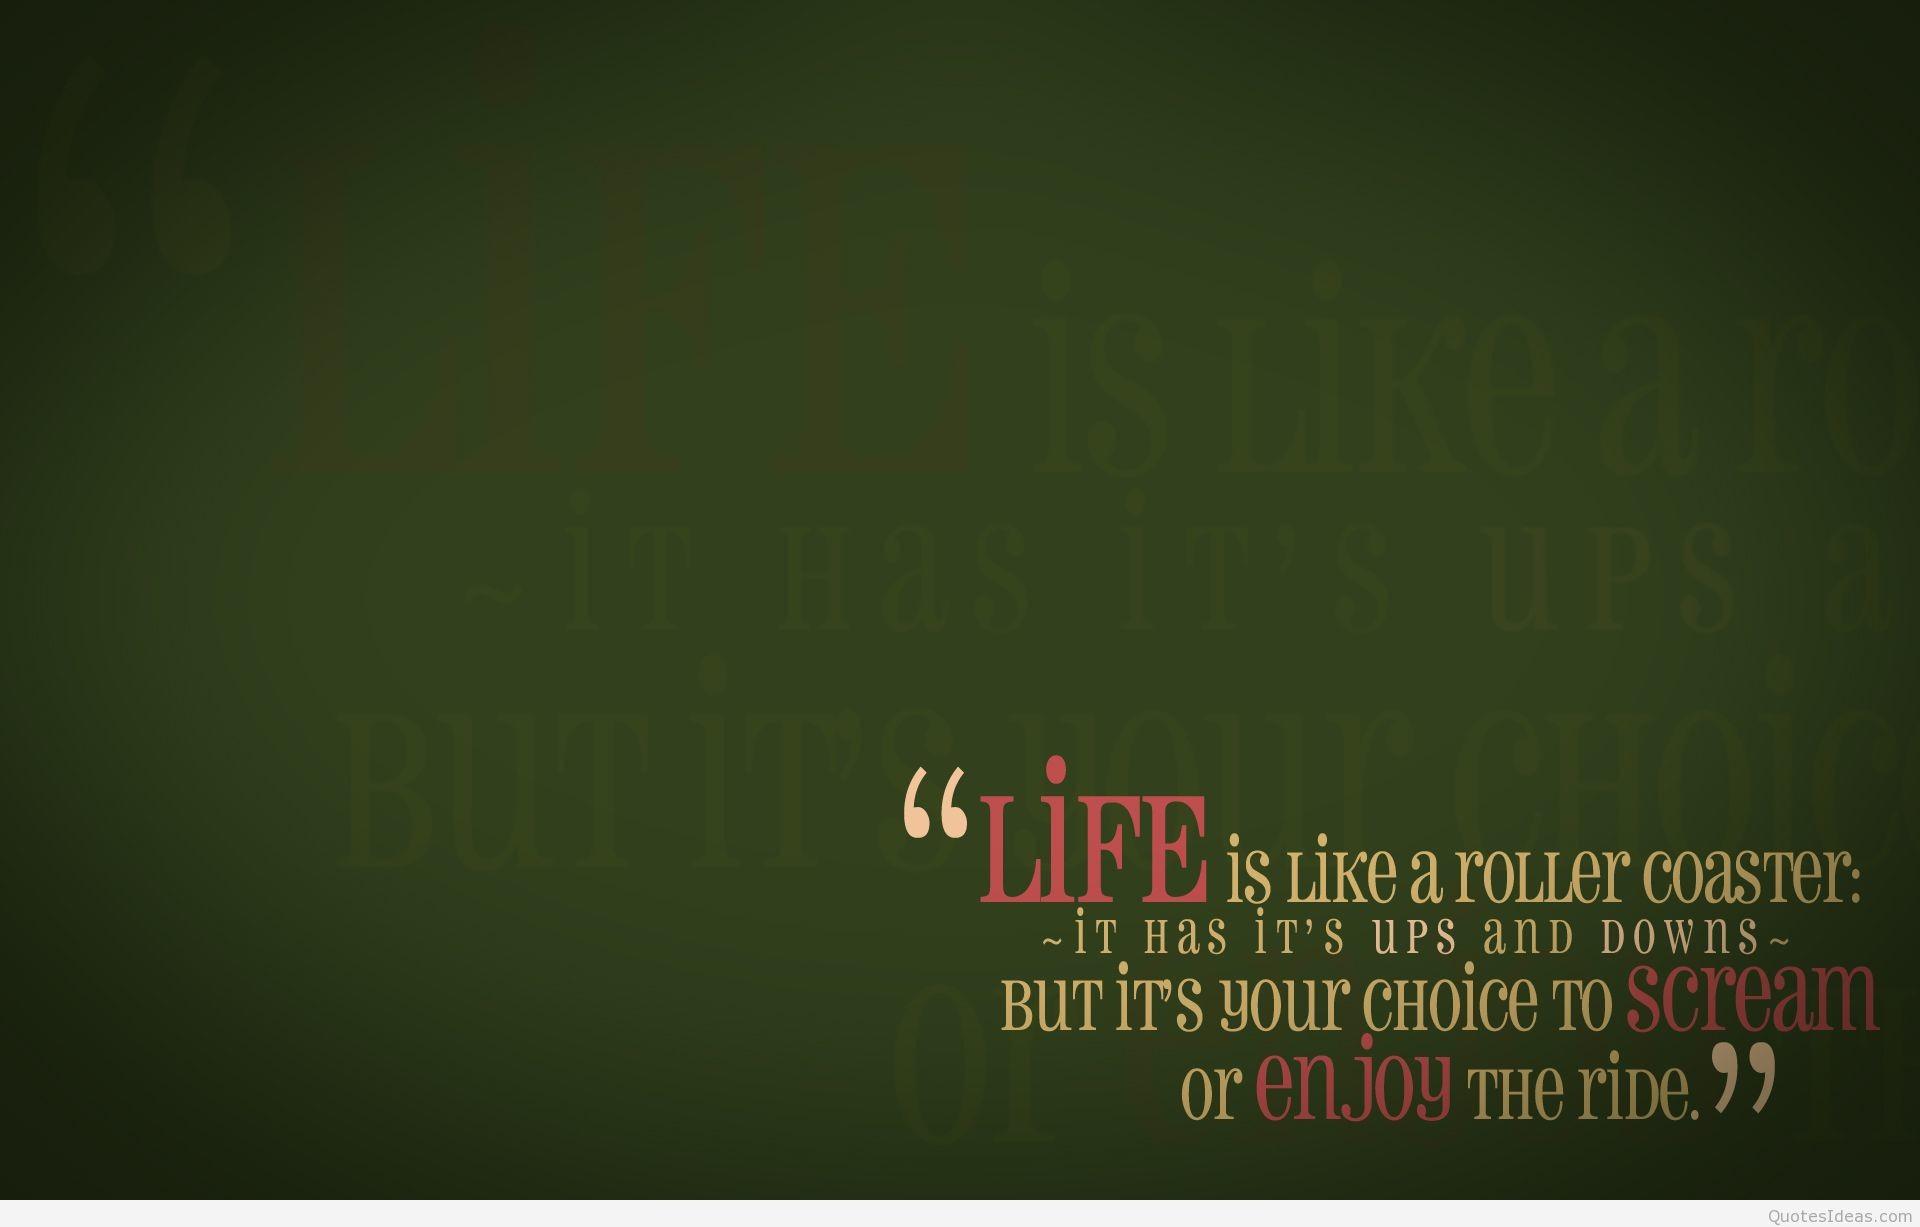 Motivational Quotes For Work Desktop Wallpaper